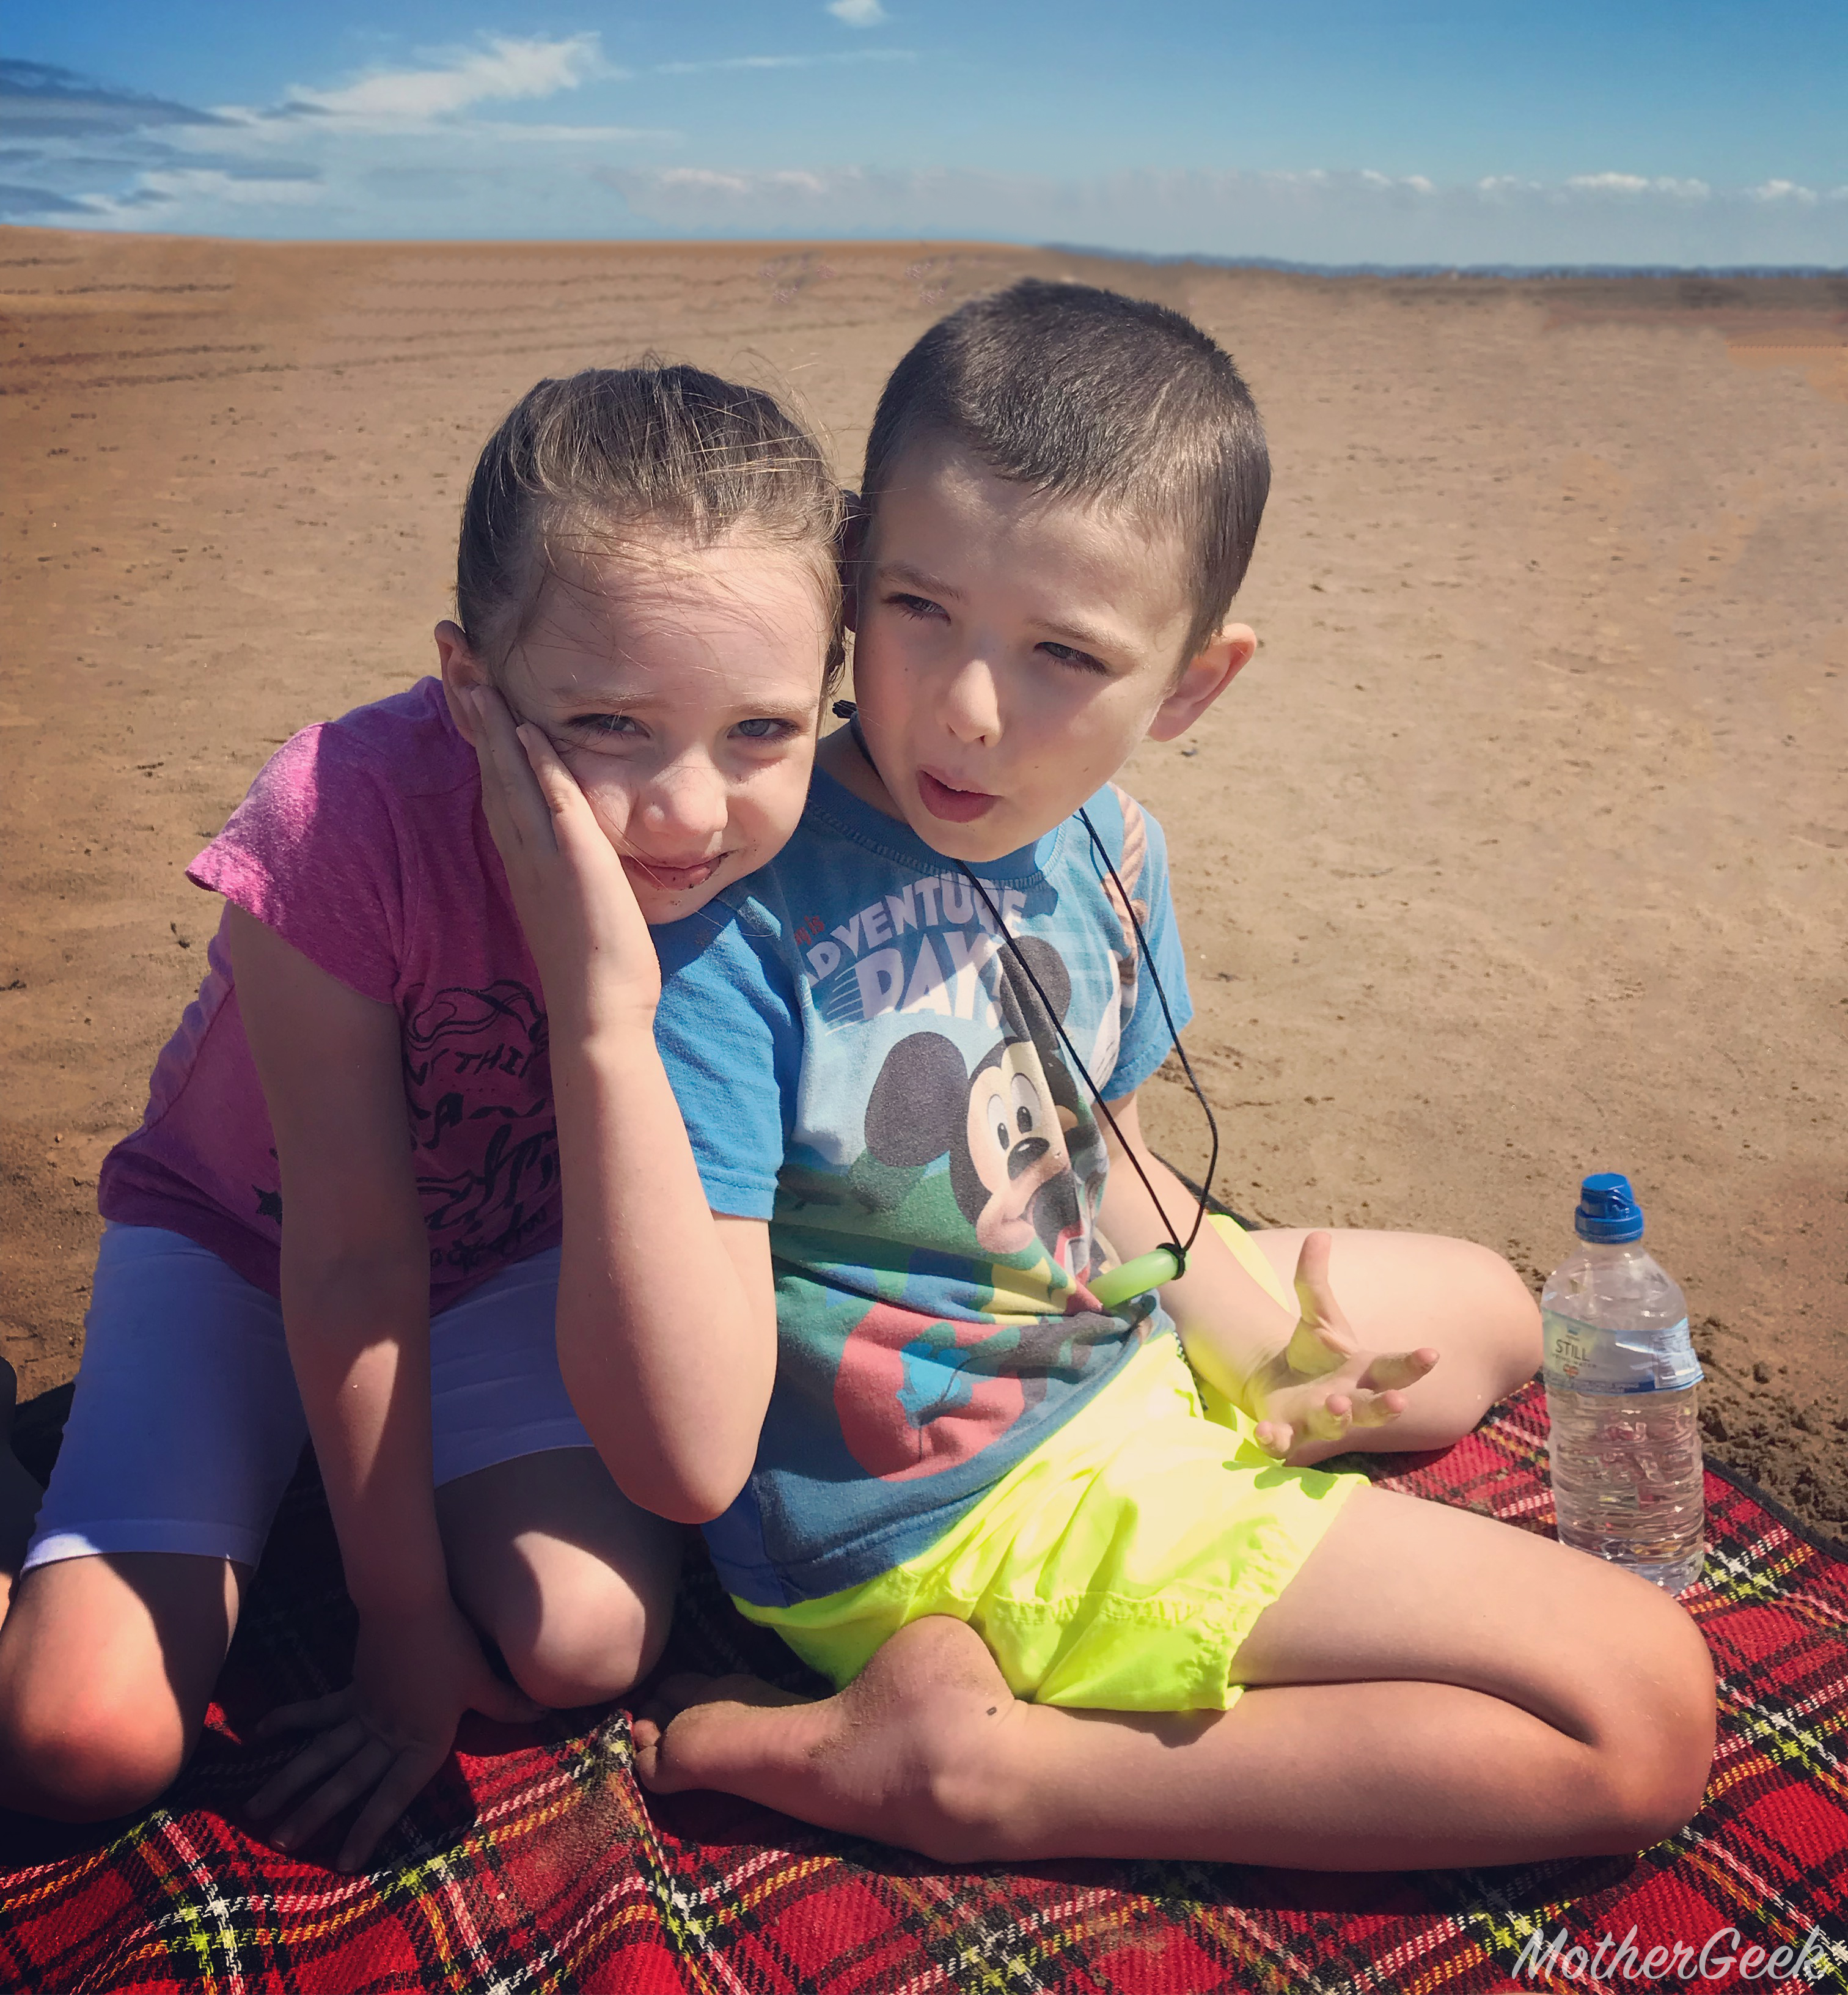 goals for 2019 - 2 kids sat on picnic blanket on the beach.